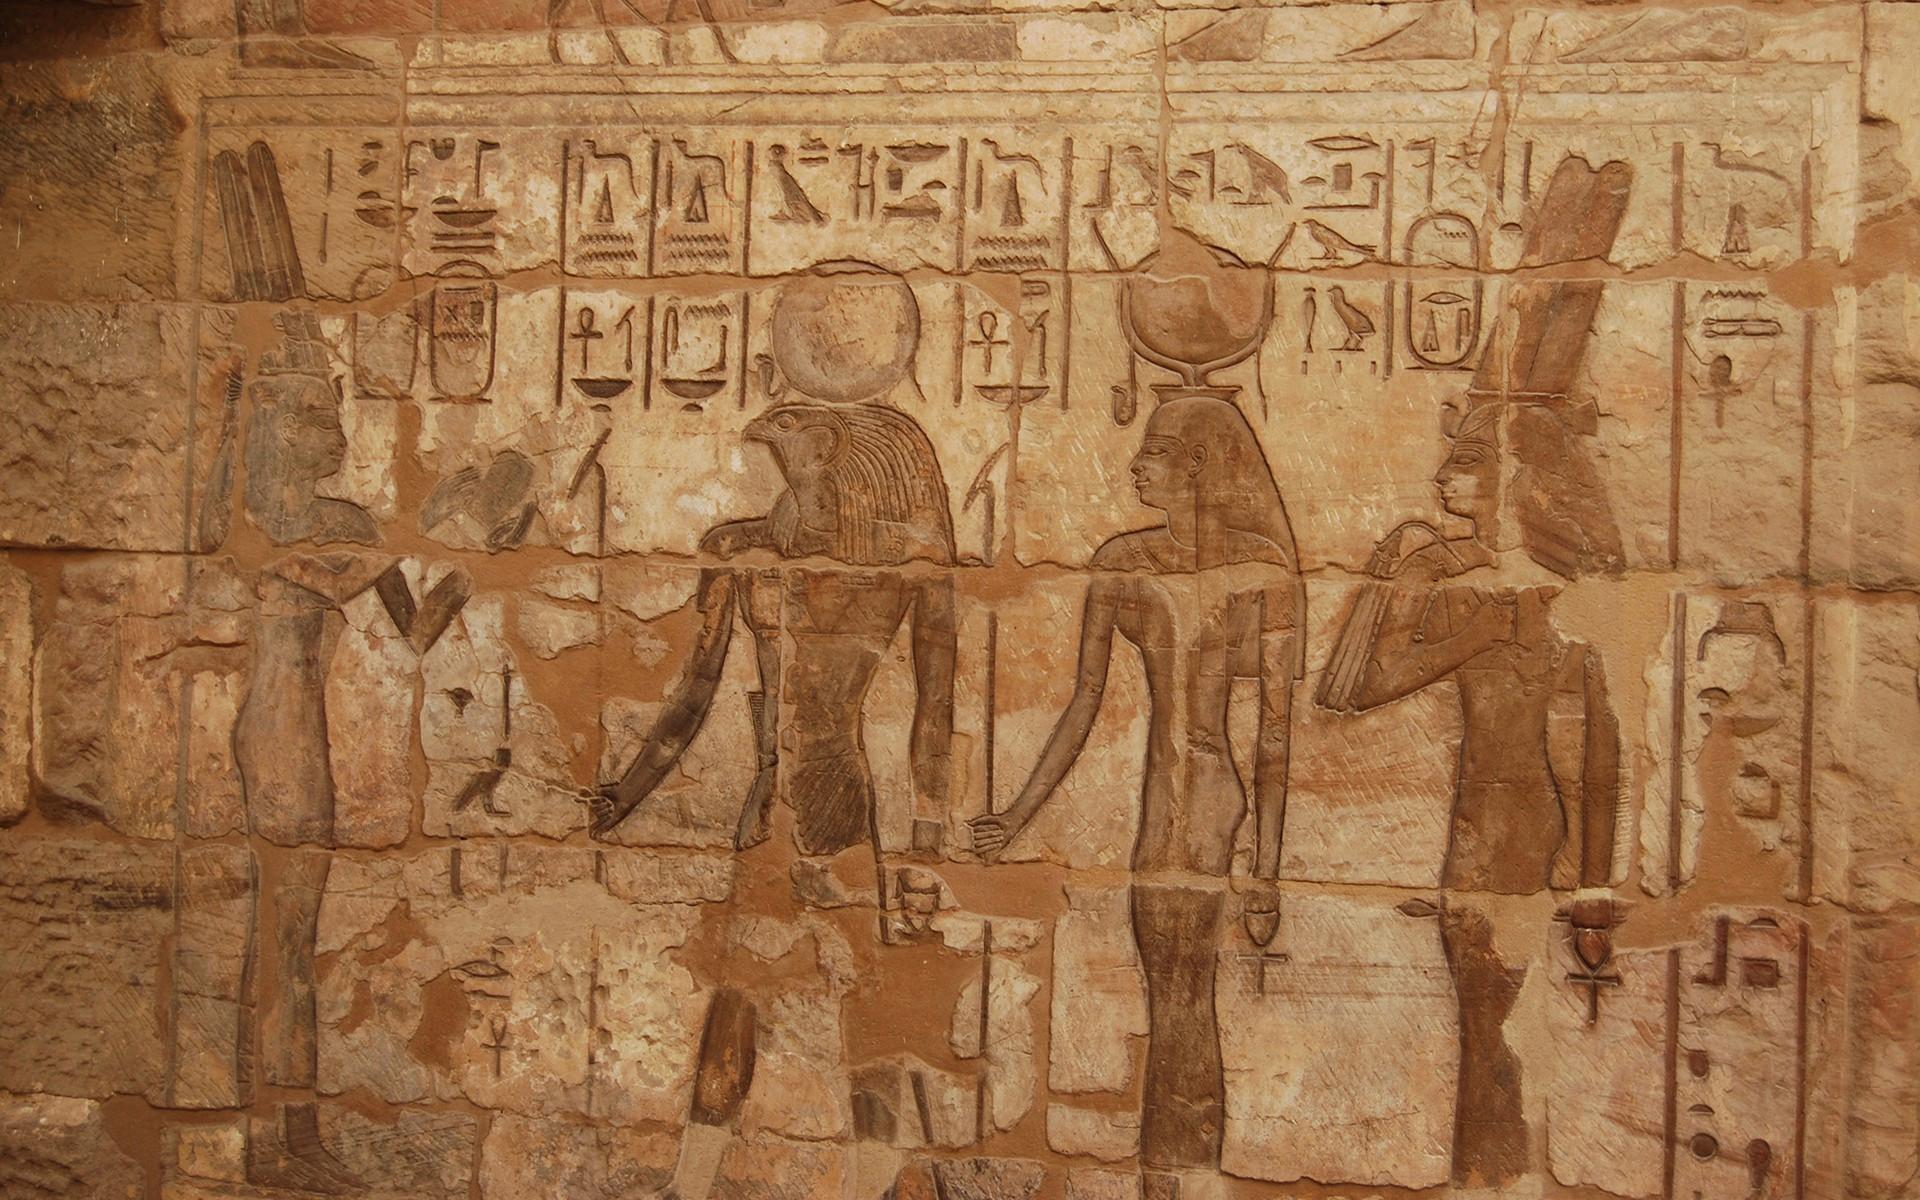 wallpaper.wiki-HD-Egyptian-Hieroglyphics-Picture-PIC-WPD008113